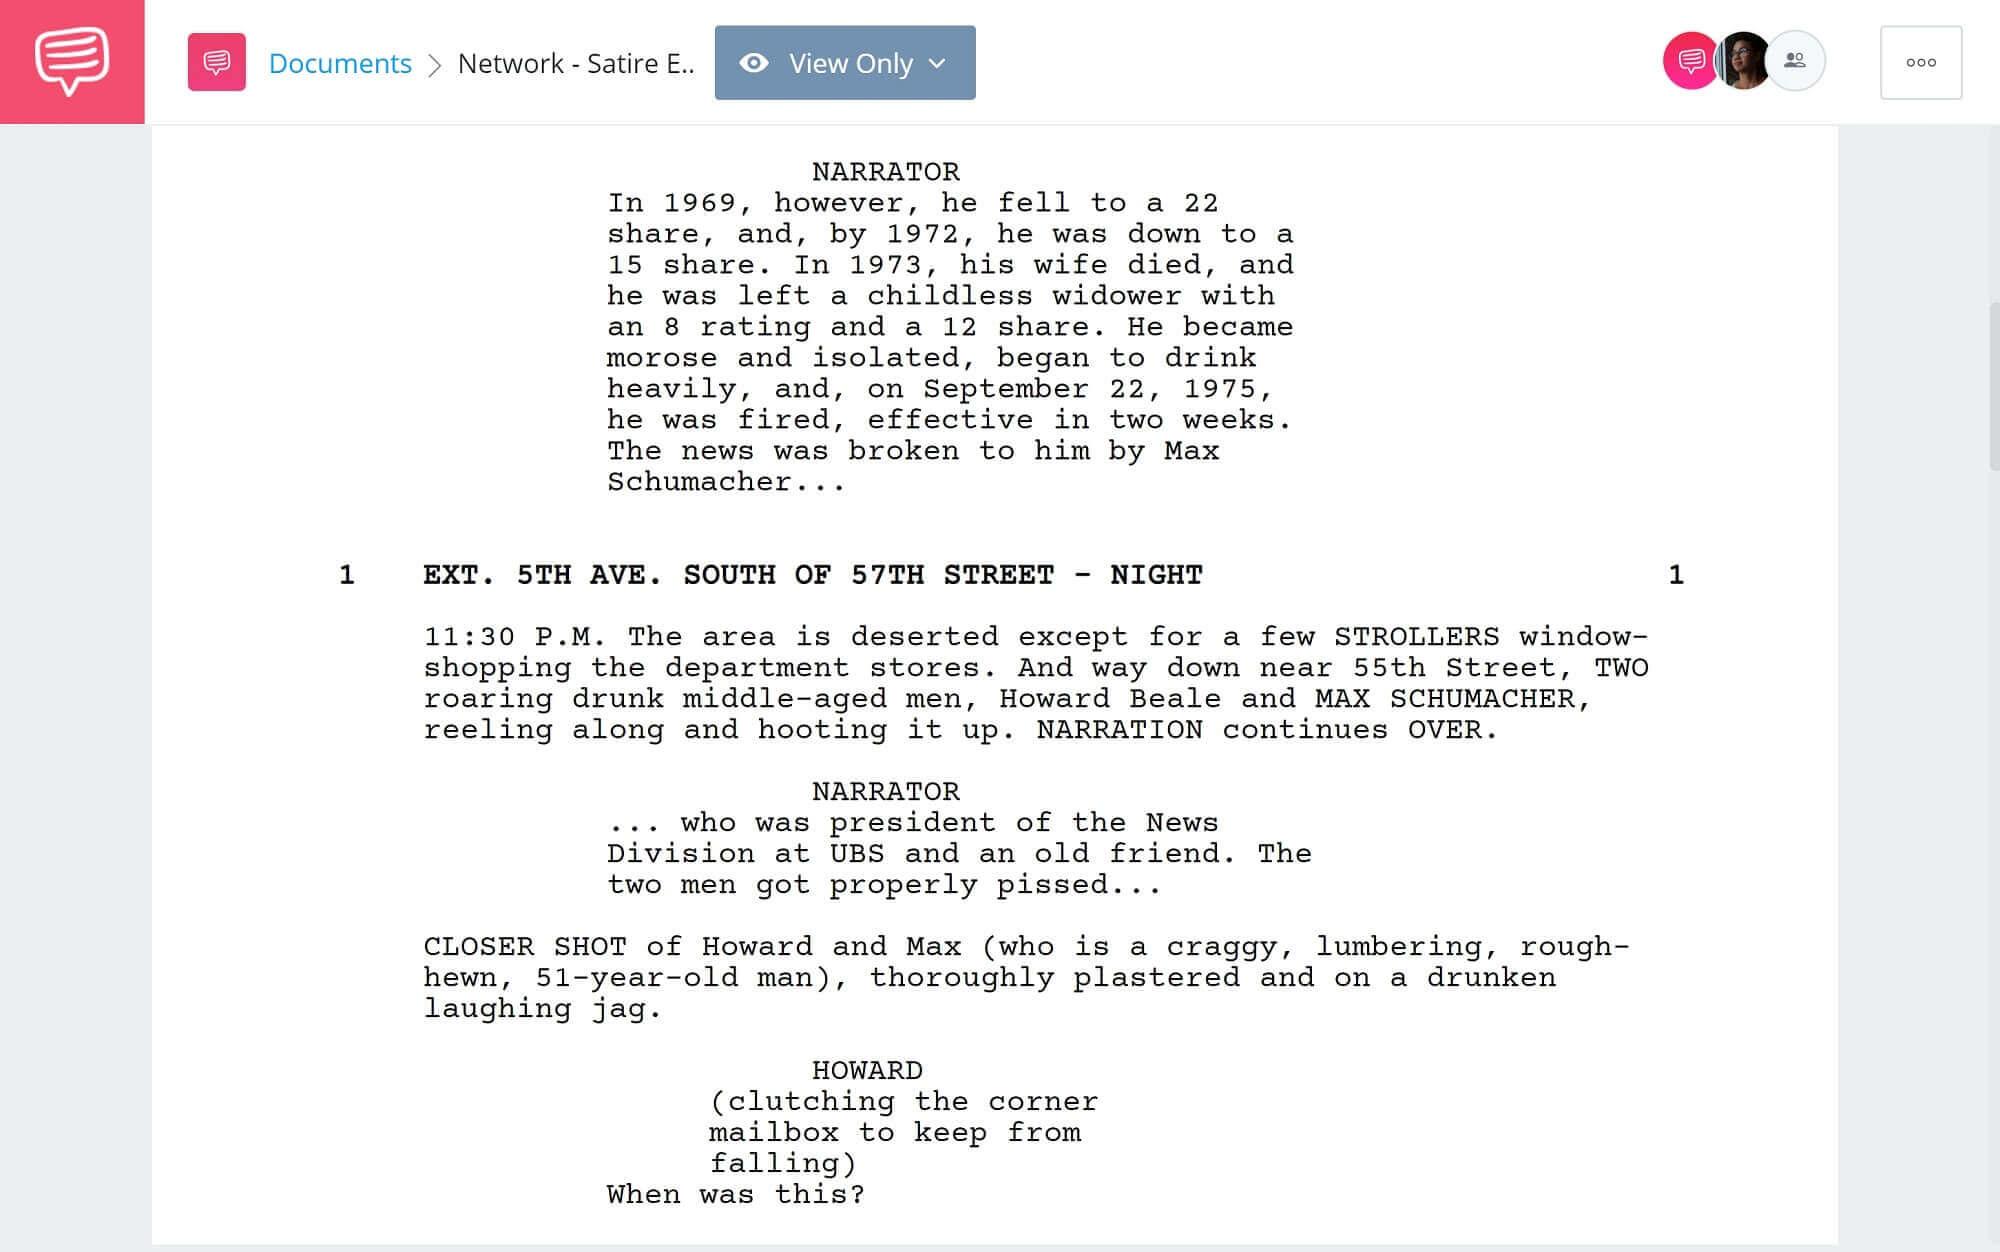 Satire Examples - Network Satire Examples - StudioBinder Scriptwriting Software